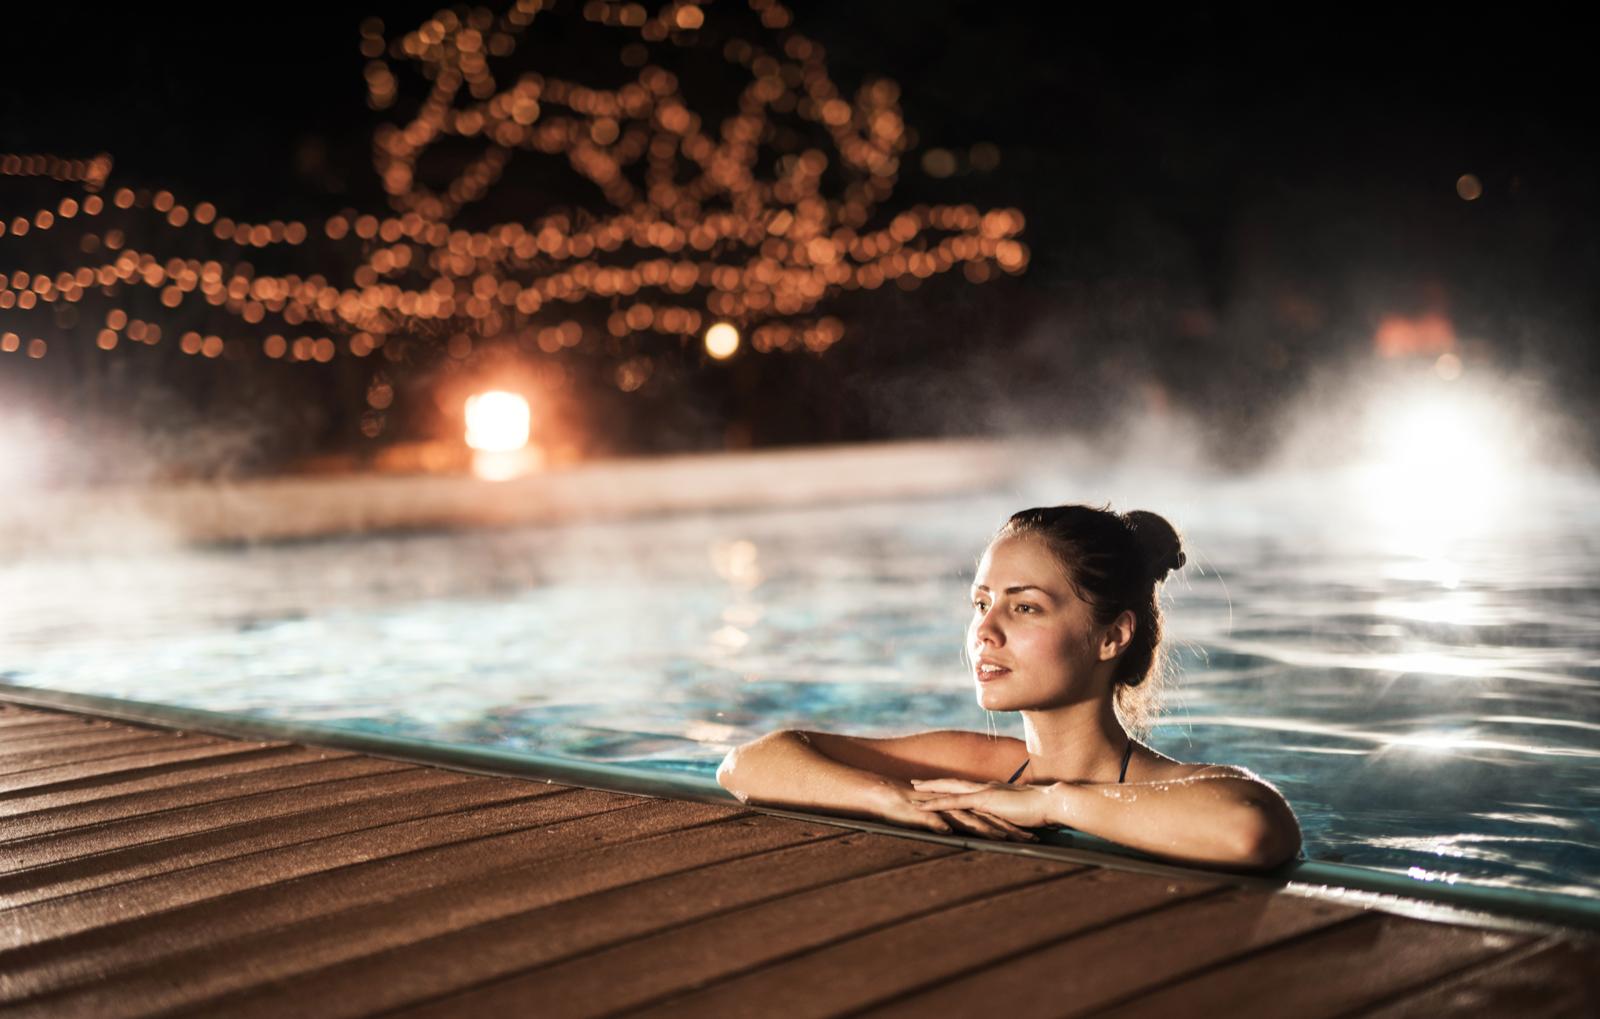 thermen-spa-hotels-rosenheim-2-tage-1-uen-2-personen-bg1